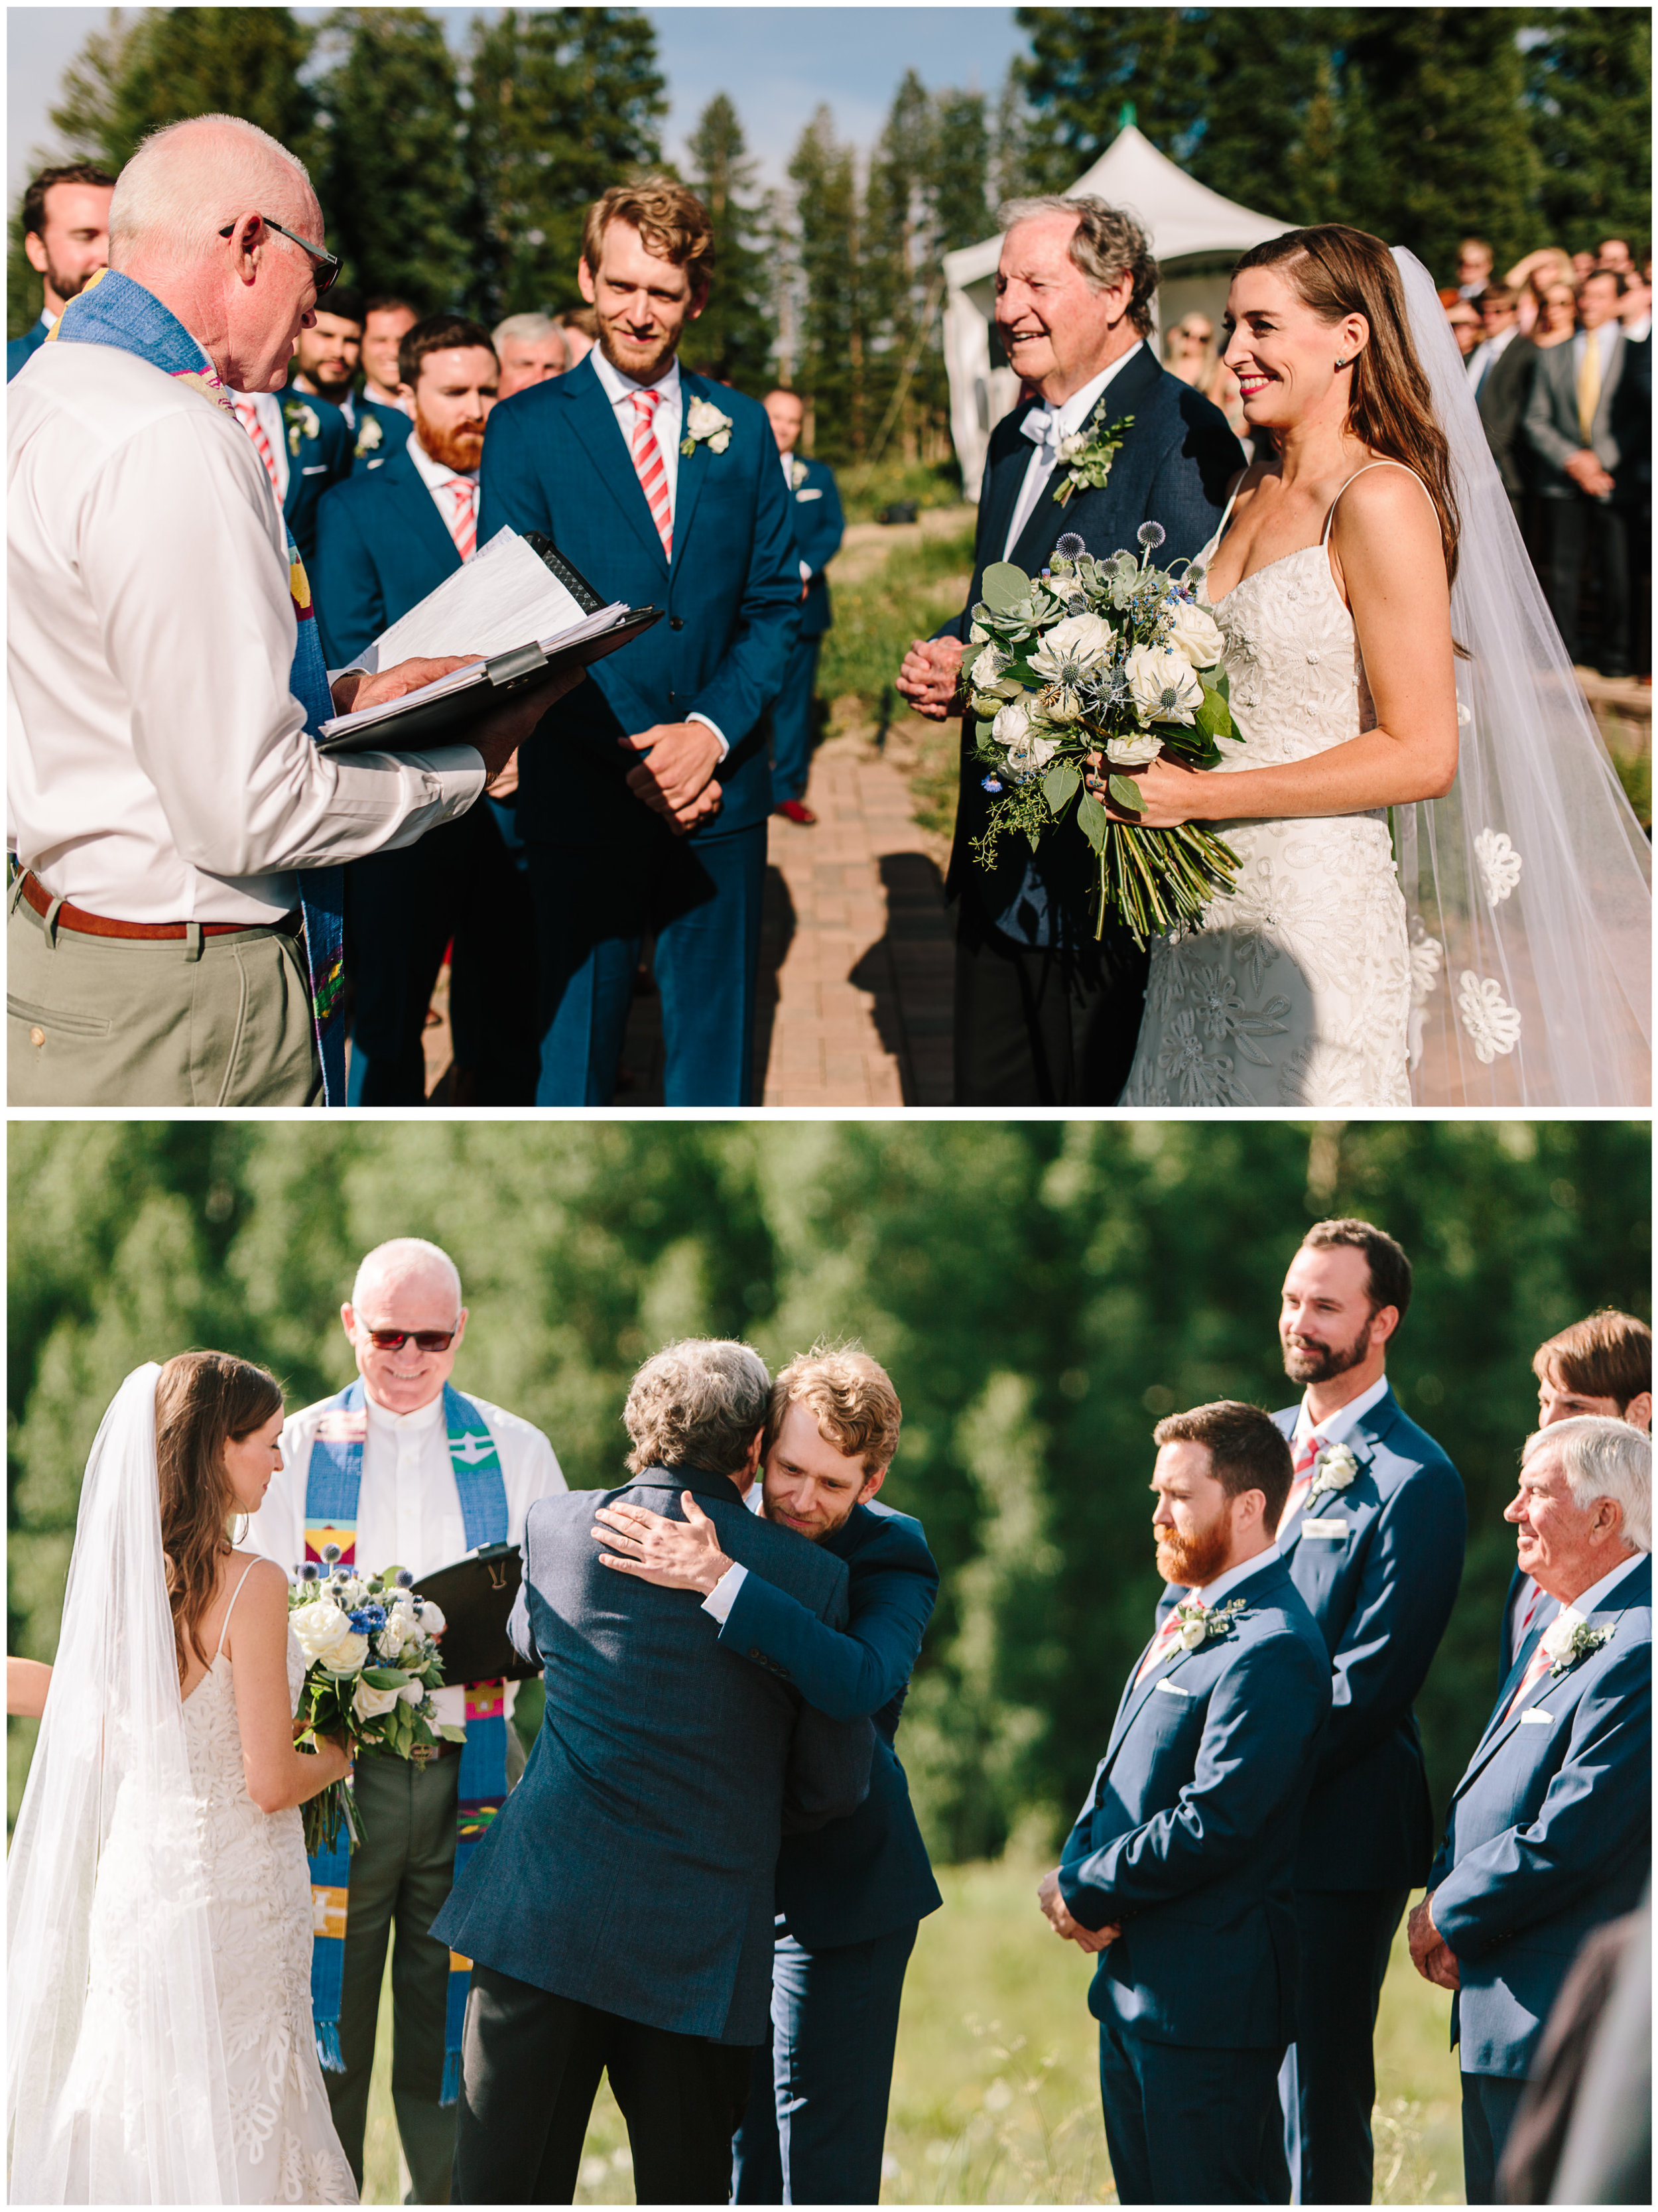 crested_butte_wedding_85.jpg